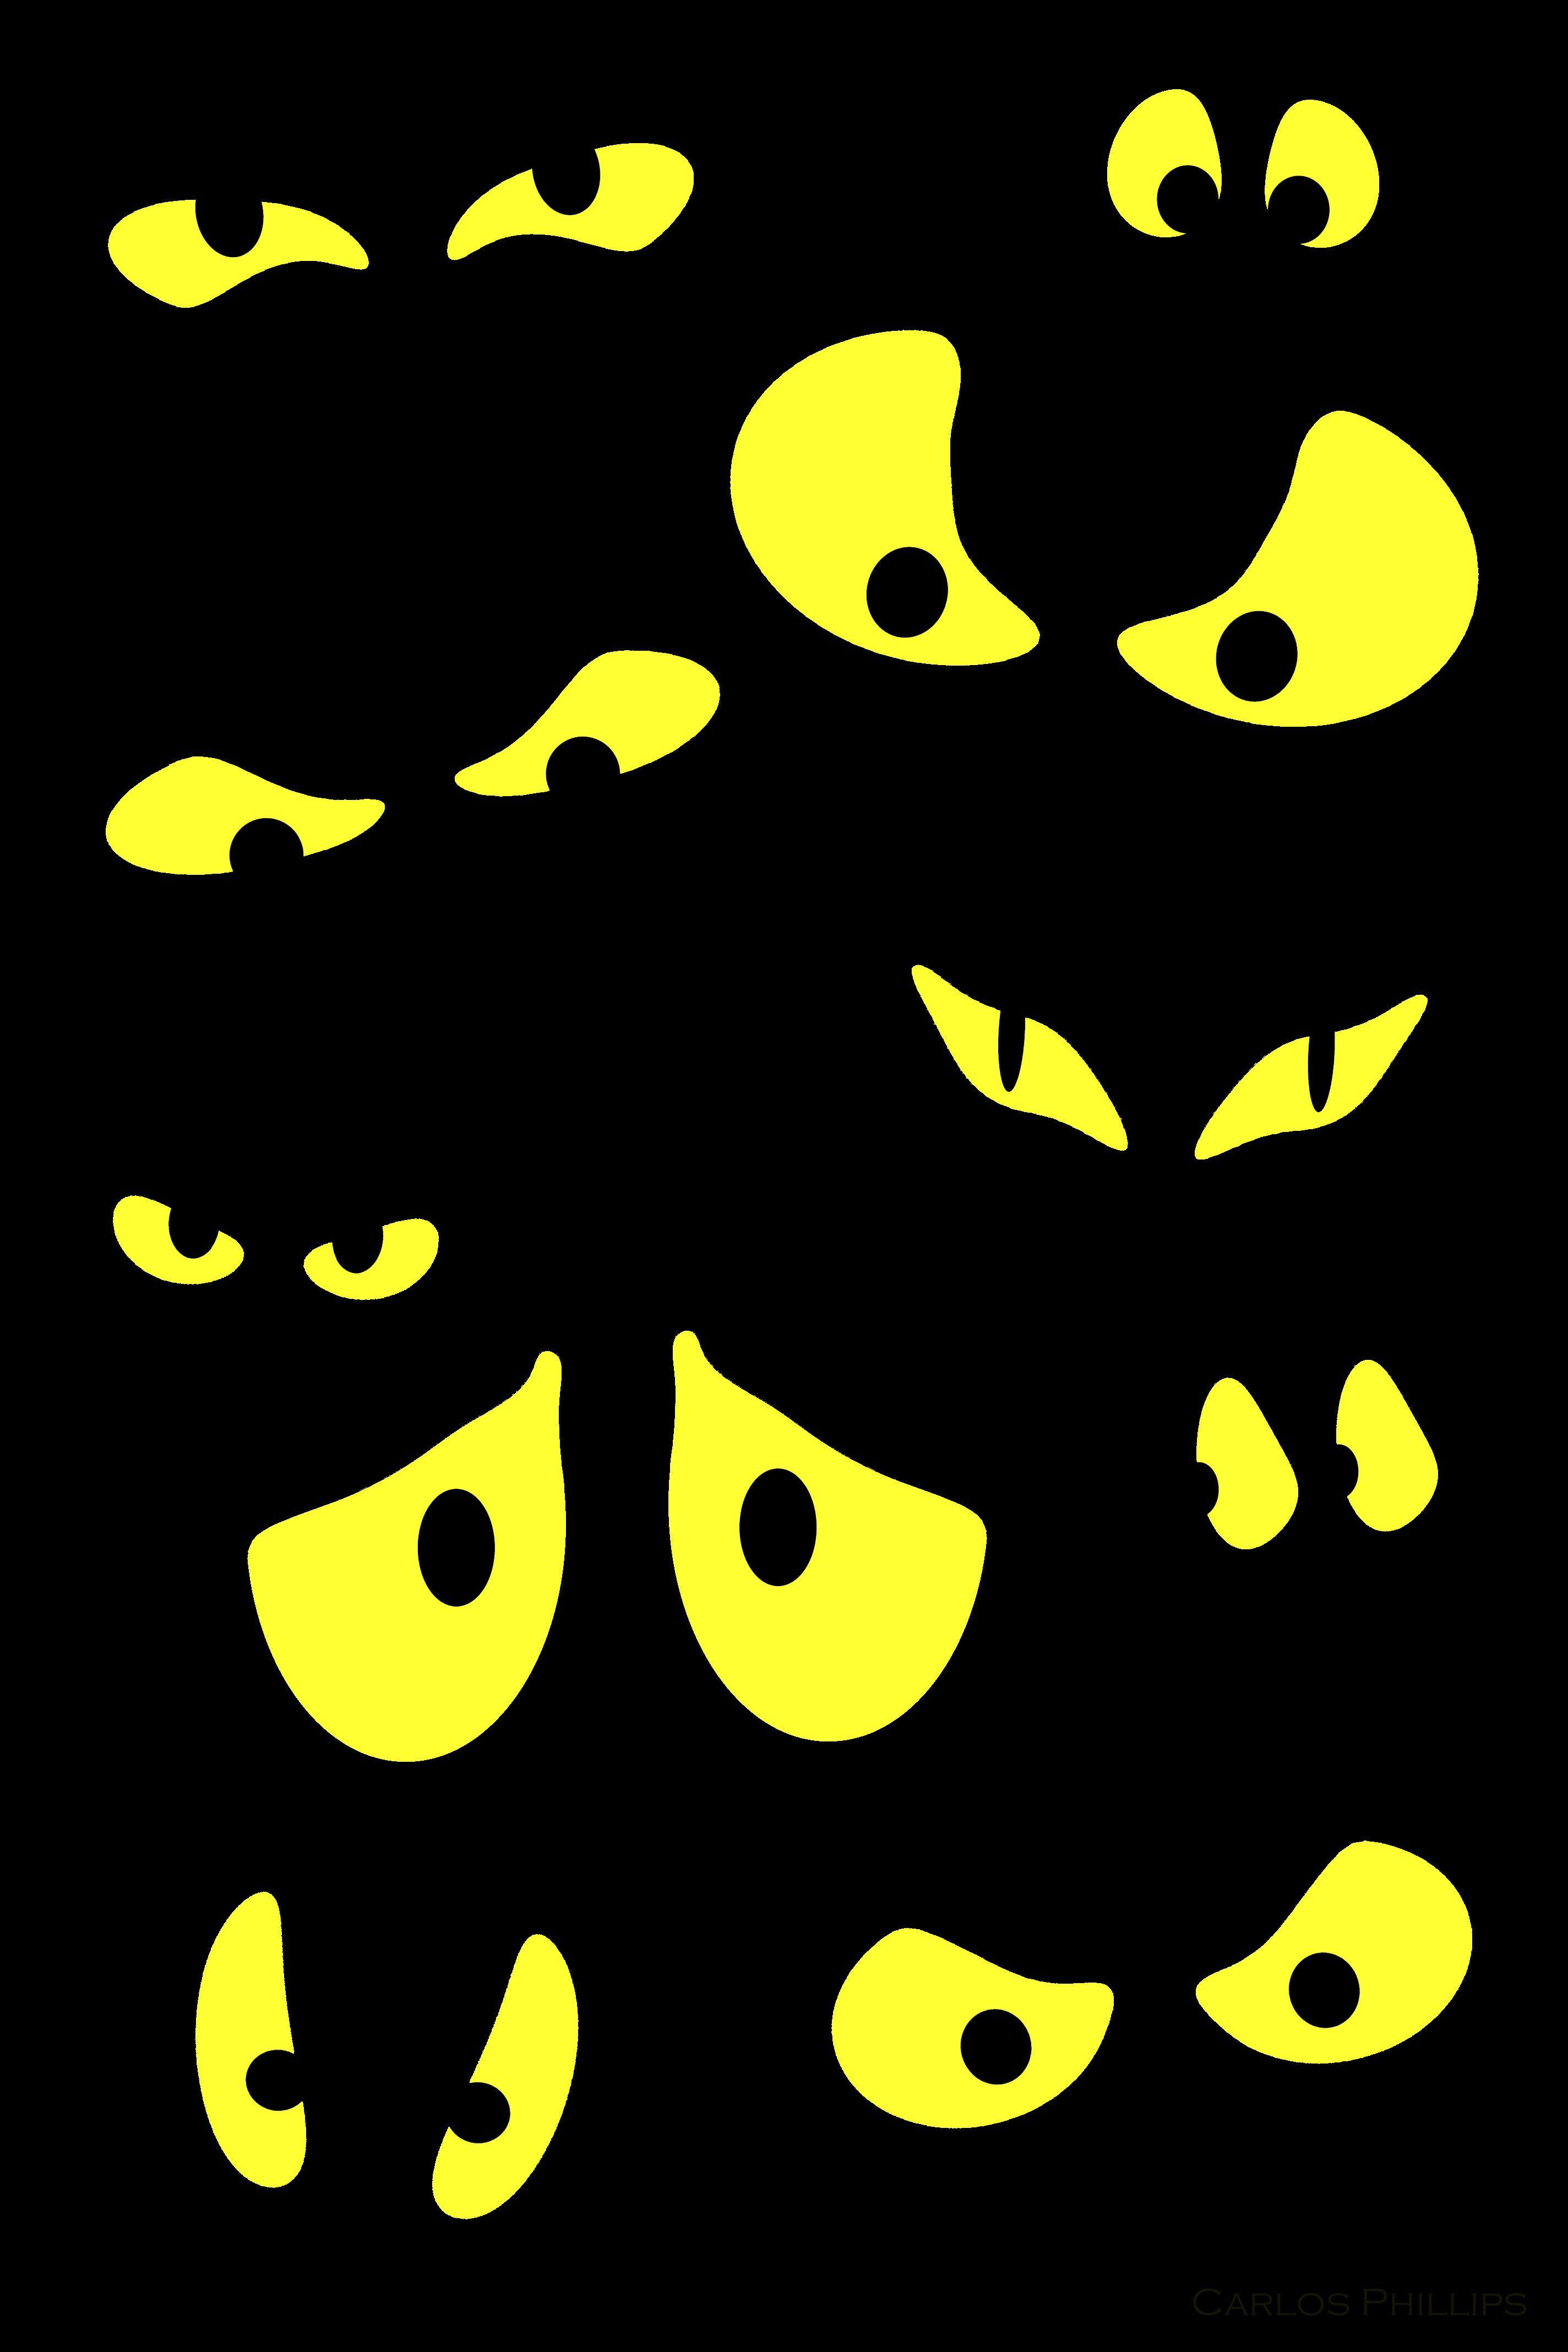 Spooky Eyes Sleeveless Top By Carlos Phillips Halloween Classroom Decorations Spooky Eyes Halloween Eyes